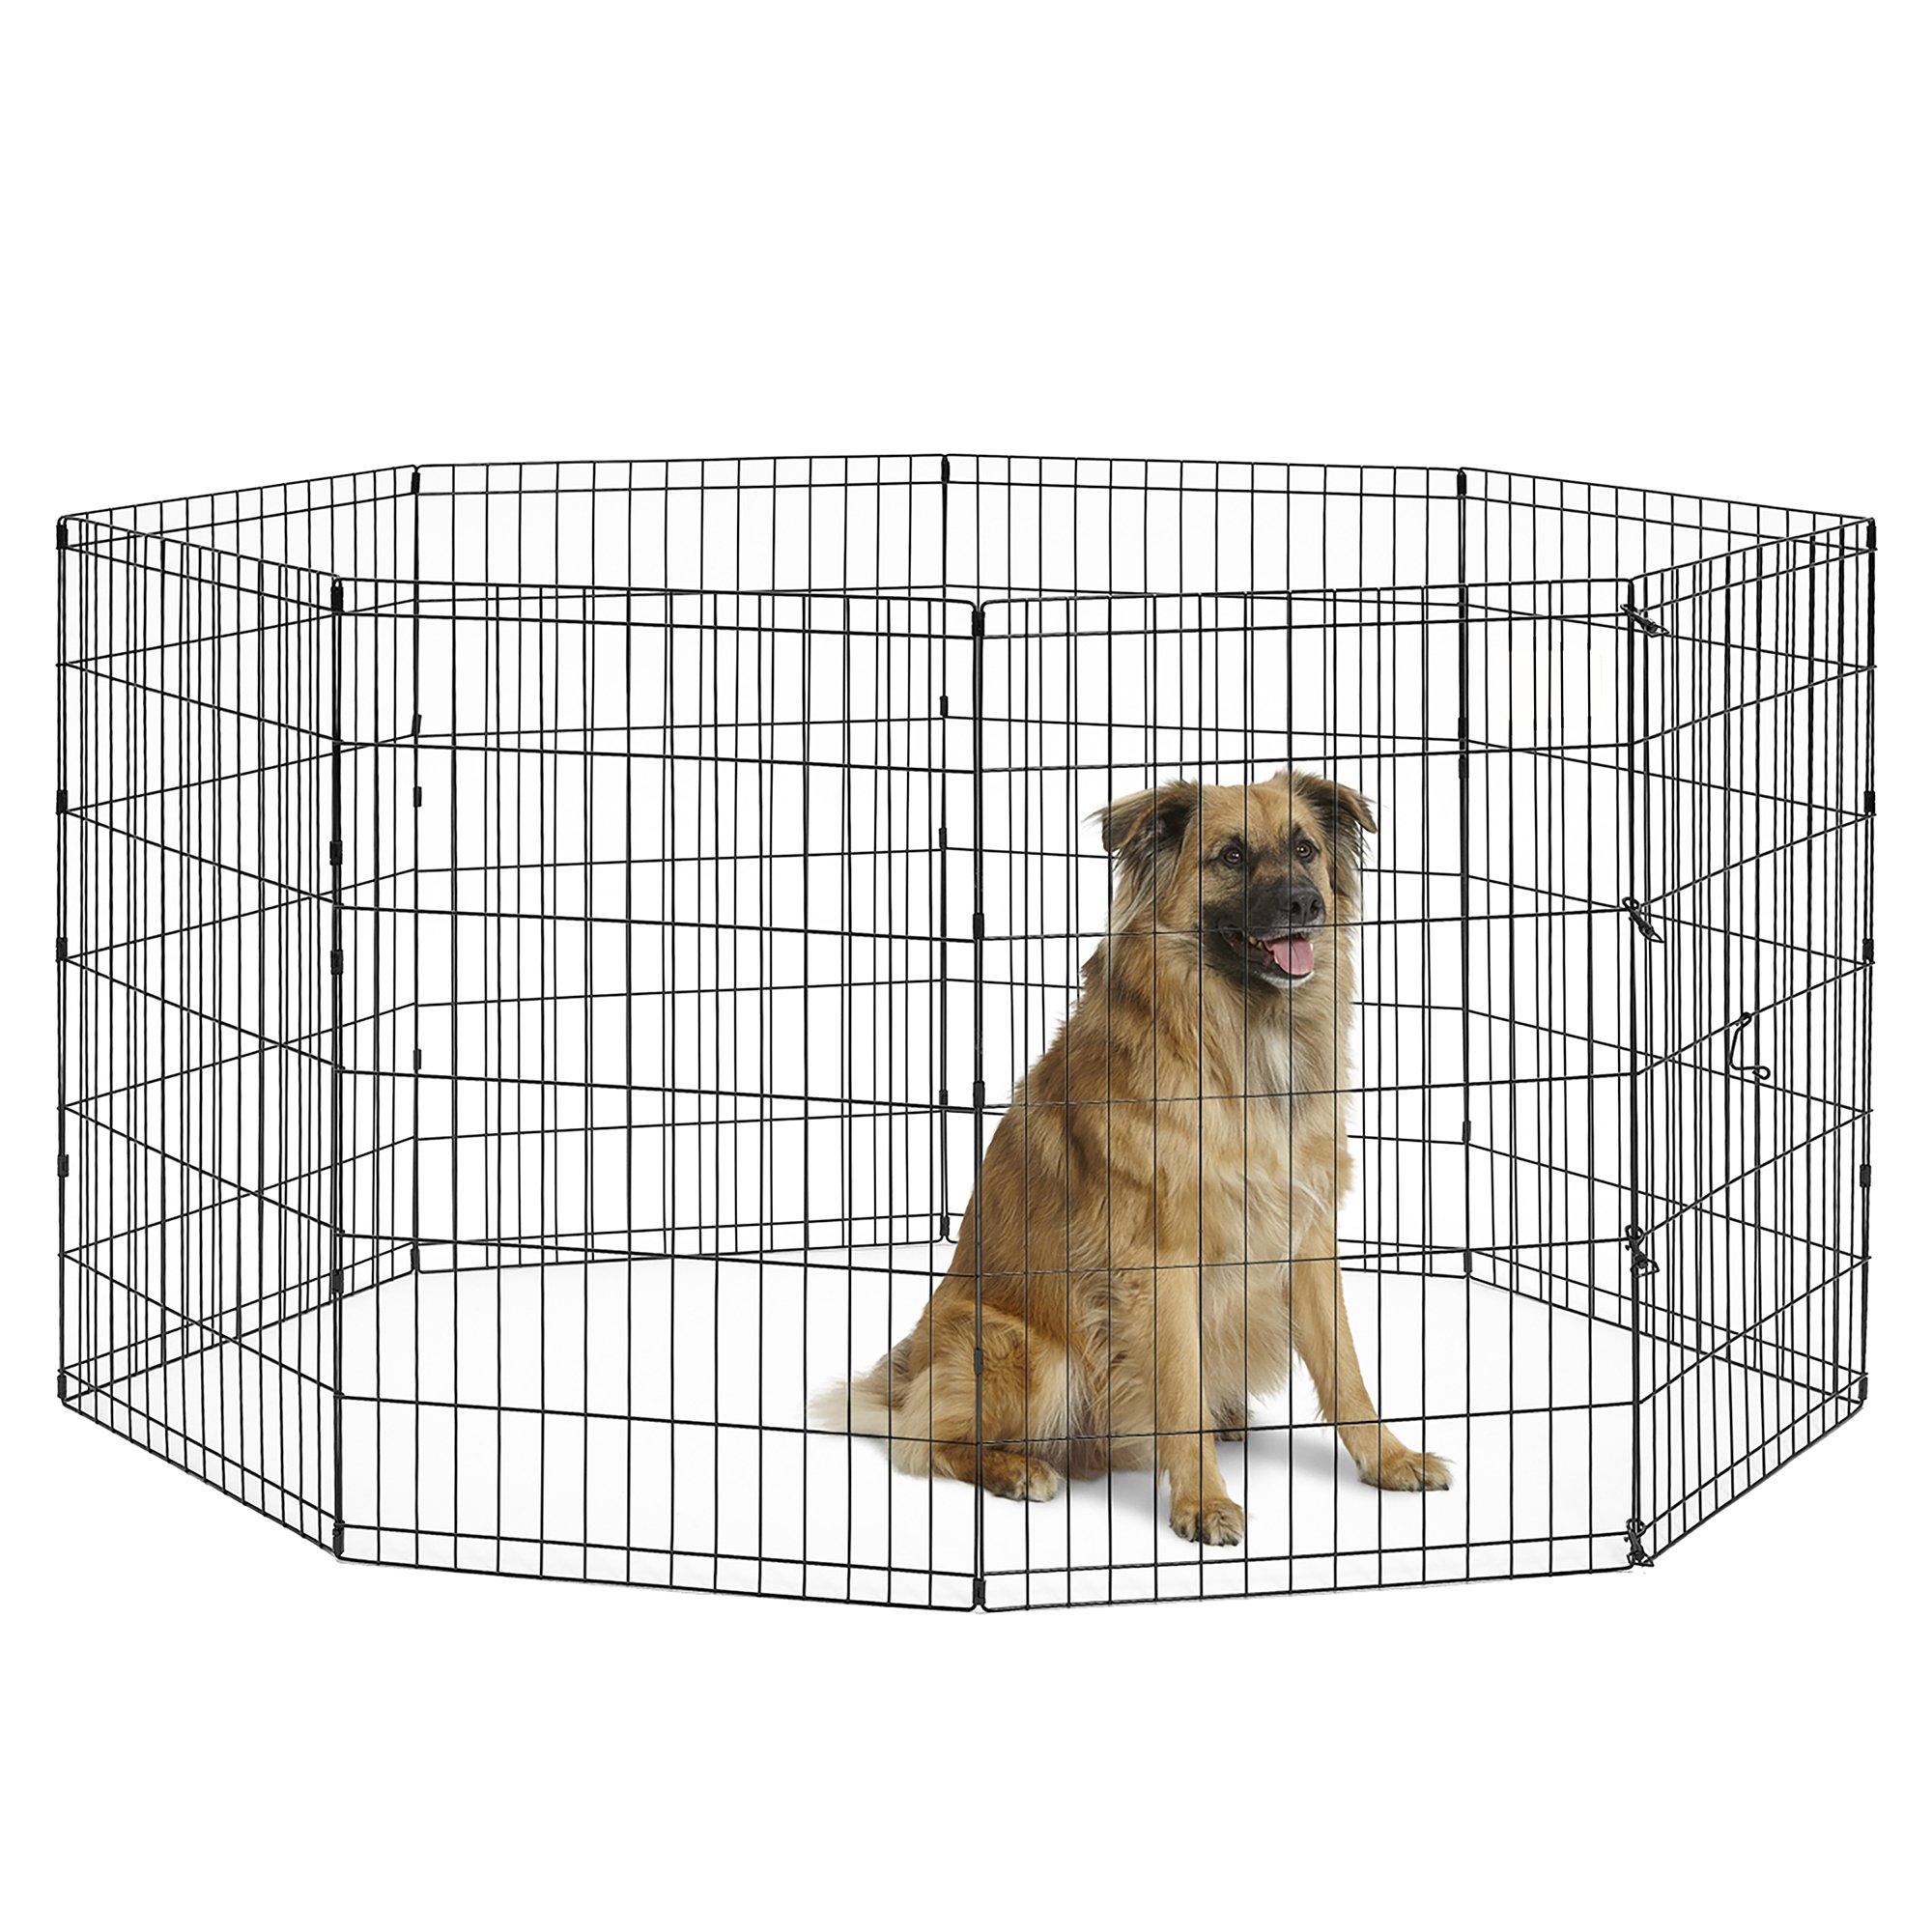 New World Pet Products B554-36 Foldable Exercise Pet Playpen, Black, Intermediate/24 x 36''